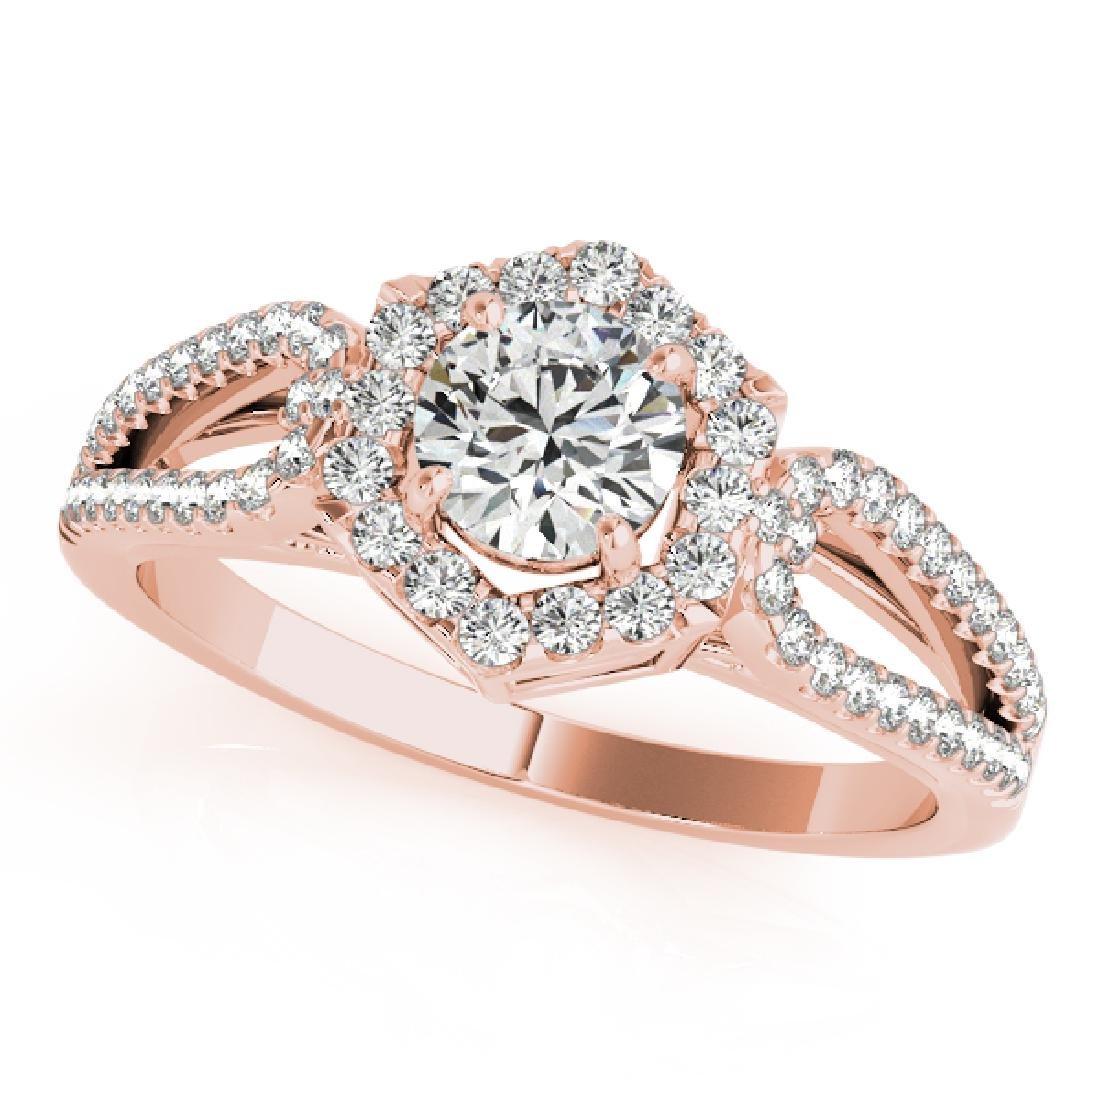 CERTIFIED 18K ROSE GOLD 1.38 CT G-H/VS-SI1 DIAMOND HALO